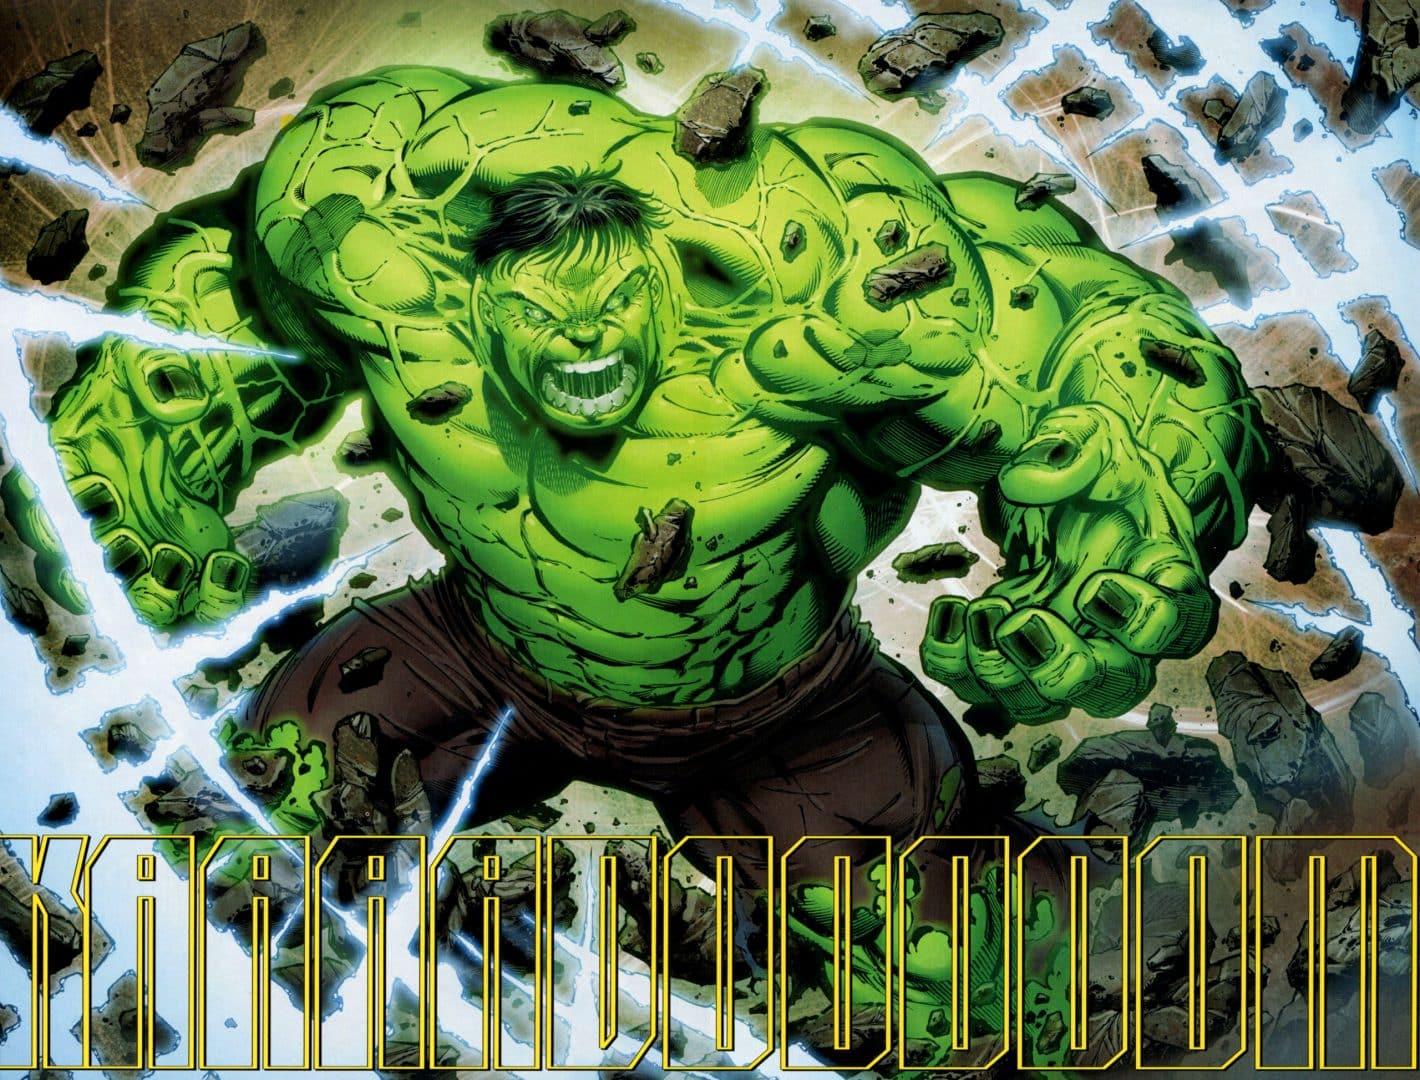 Hulk - Origem, características e poderes do Gigante Esmeralda